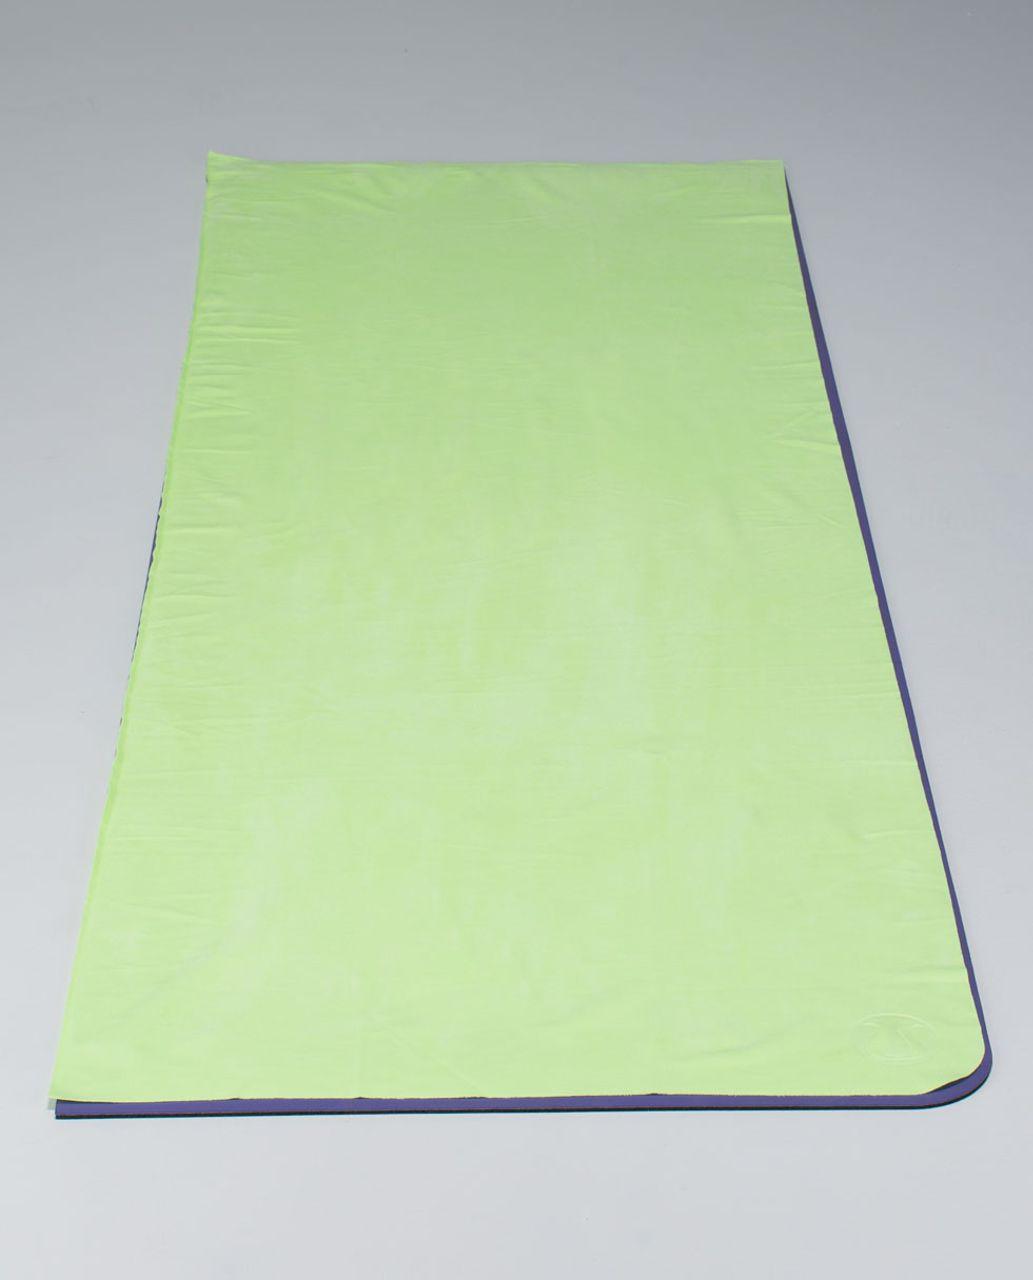 Lululemon The Towel - Clear Mint